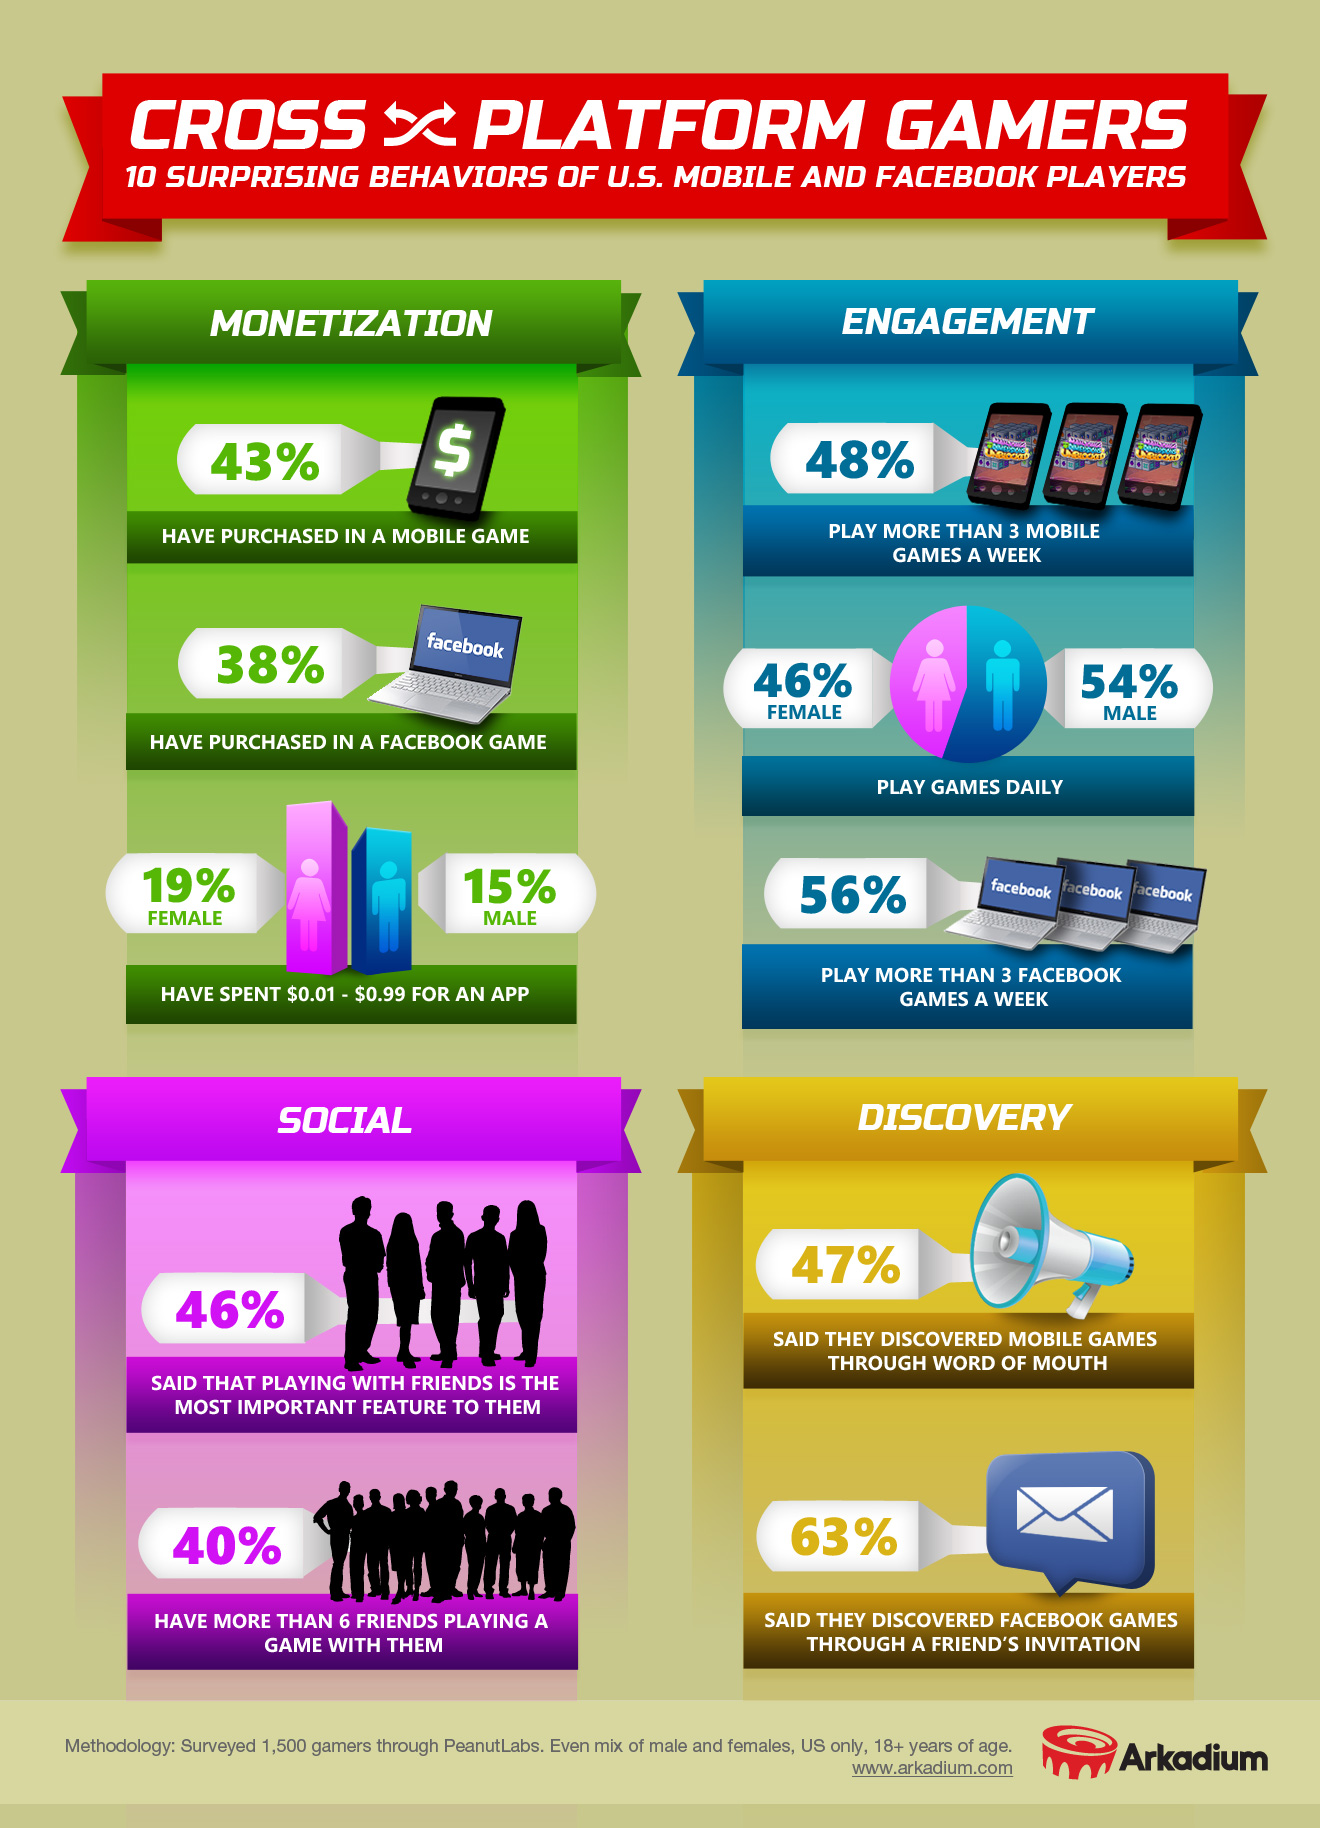 crossplatform-games-infographic